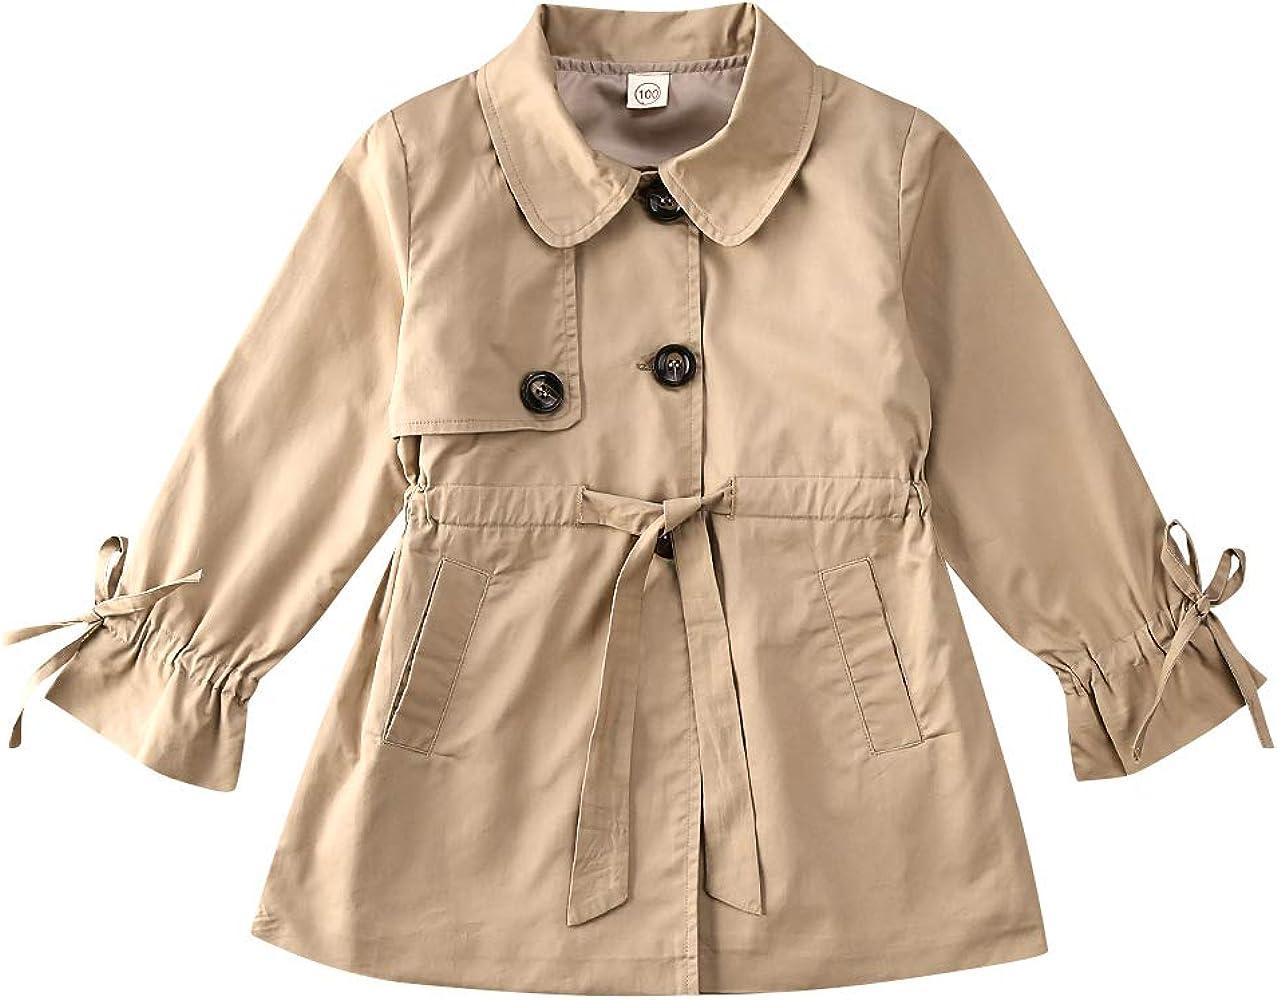 Khaki, 4-5 Years Baby Girls Parka Windbreaker Jacket Kids Autumn Winter Casual Street Trench Coat Toddler Long Sleeve Outerwear